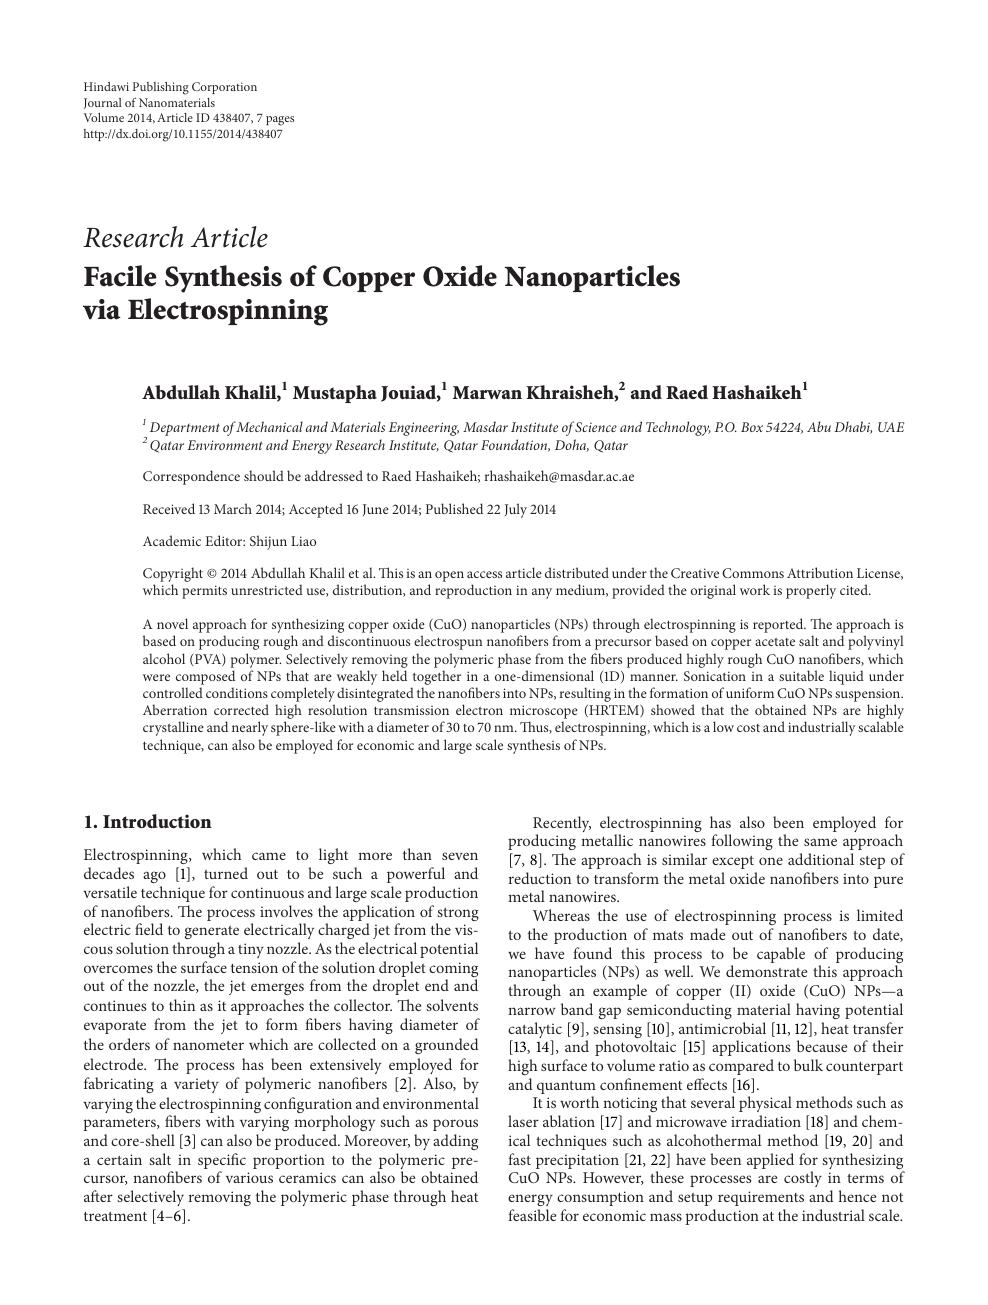 Facile Synthesis of Copper Oxide Nanoparticles via